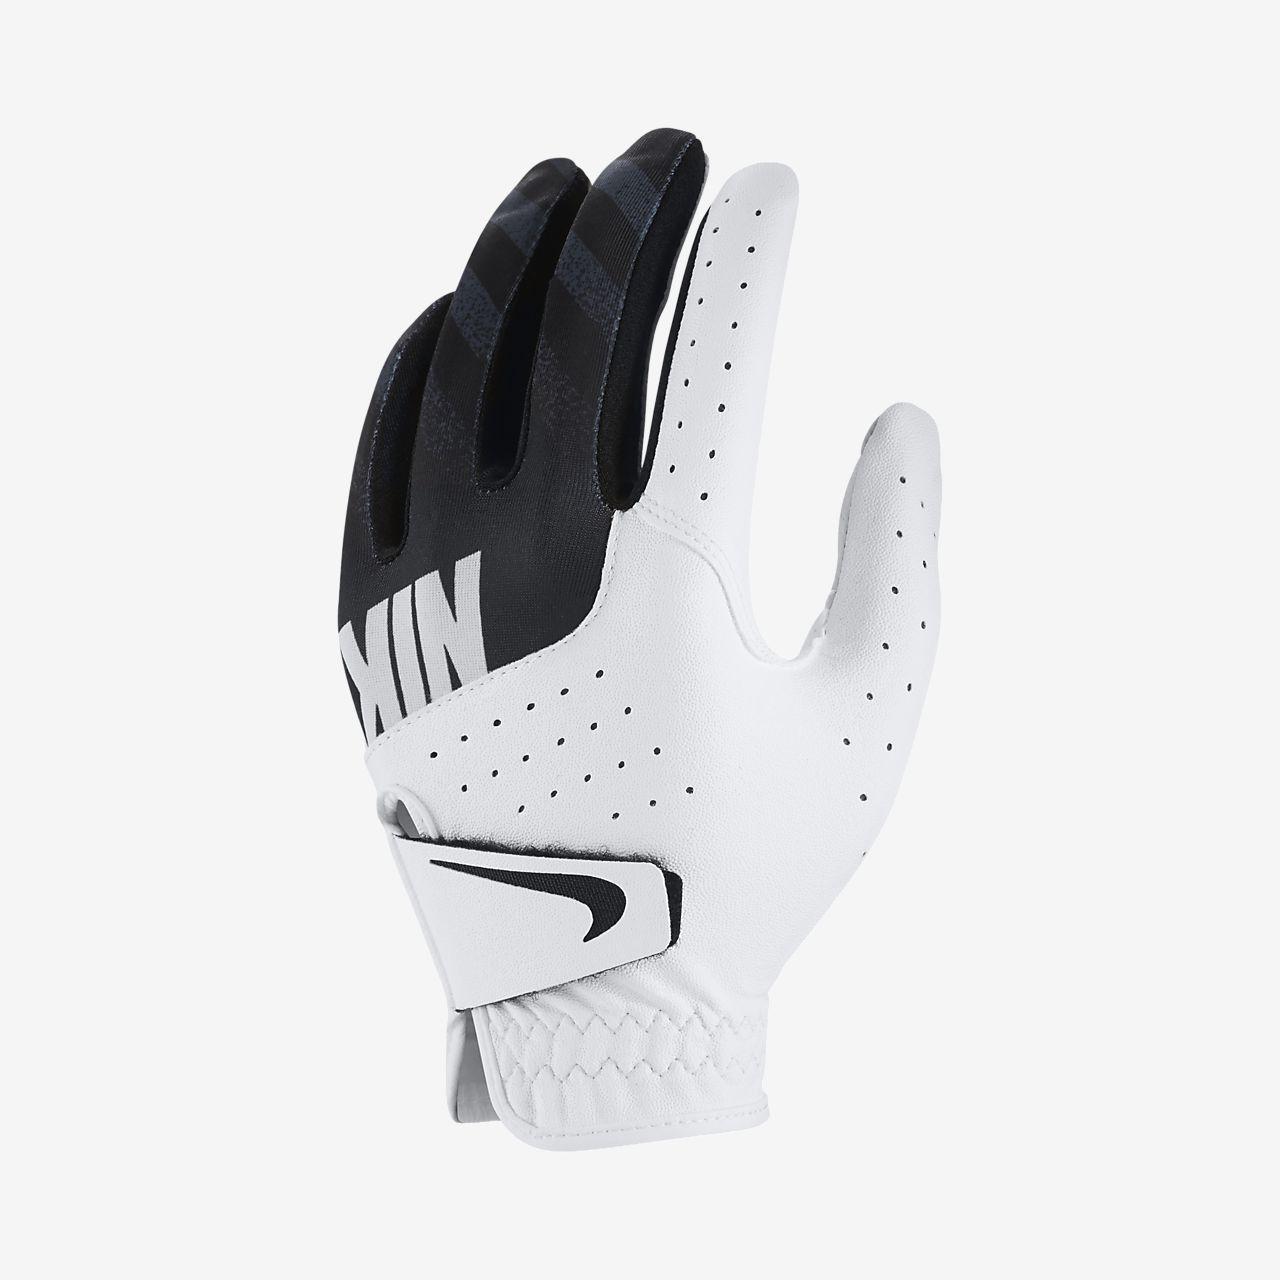 pretty cheap on sale san francisco Gant de golf Nike Sport pour Enfant (standard/gaucher)